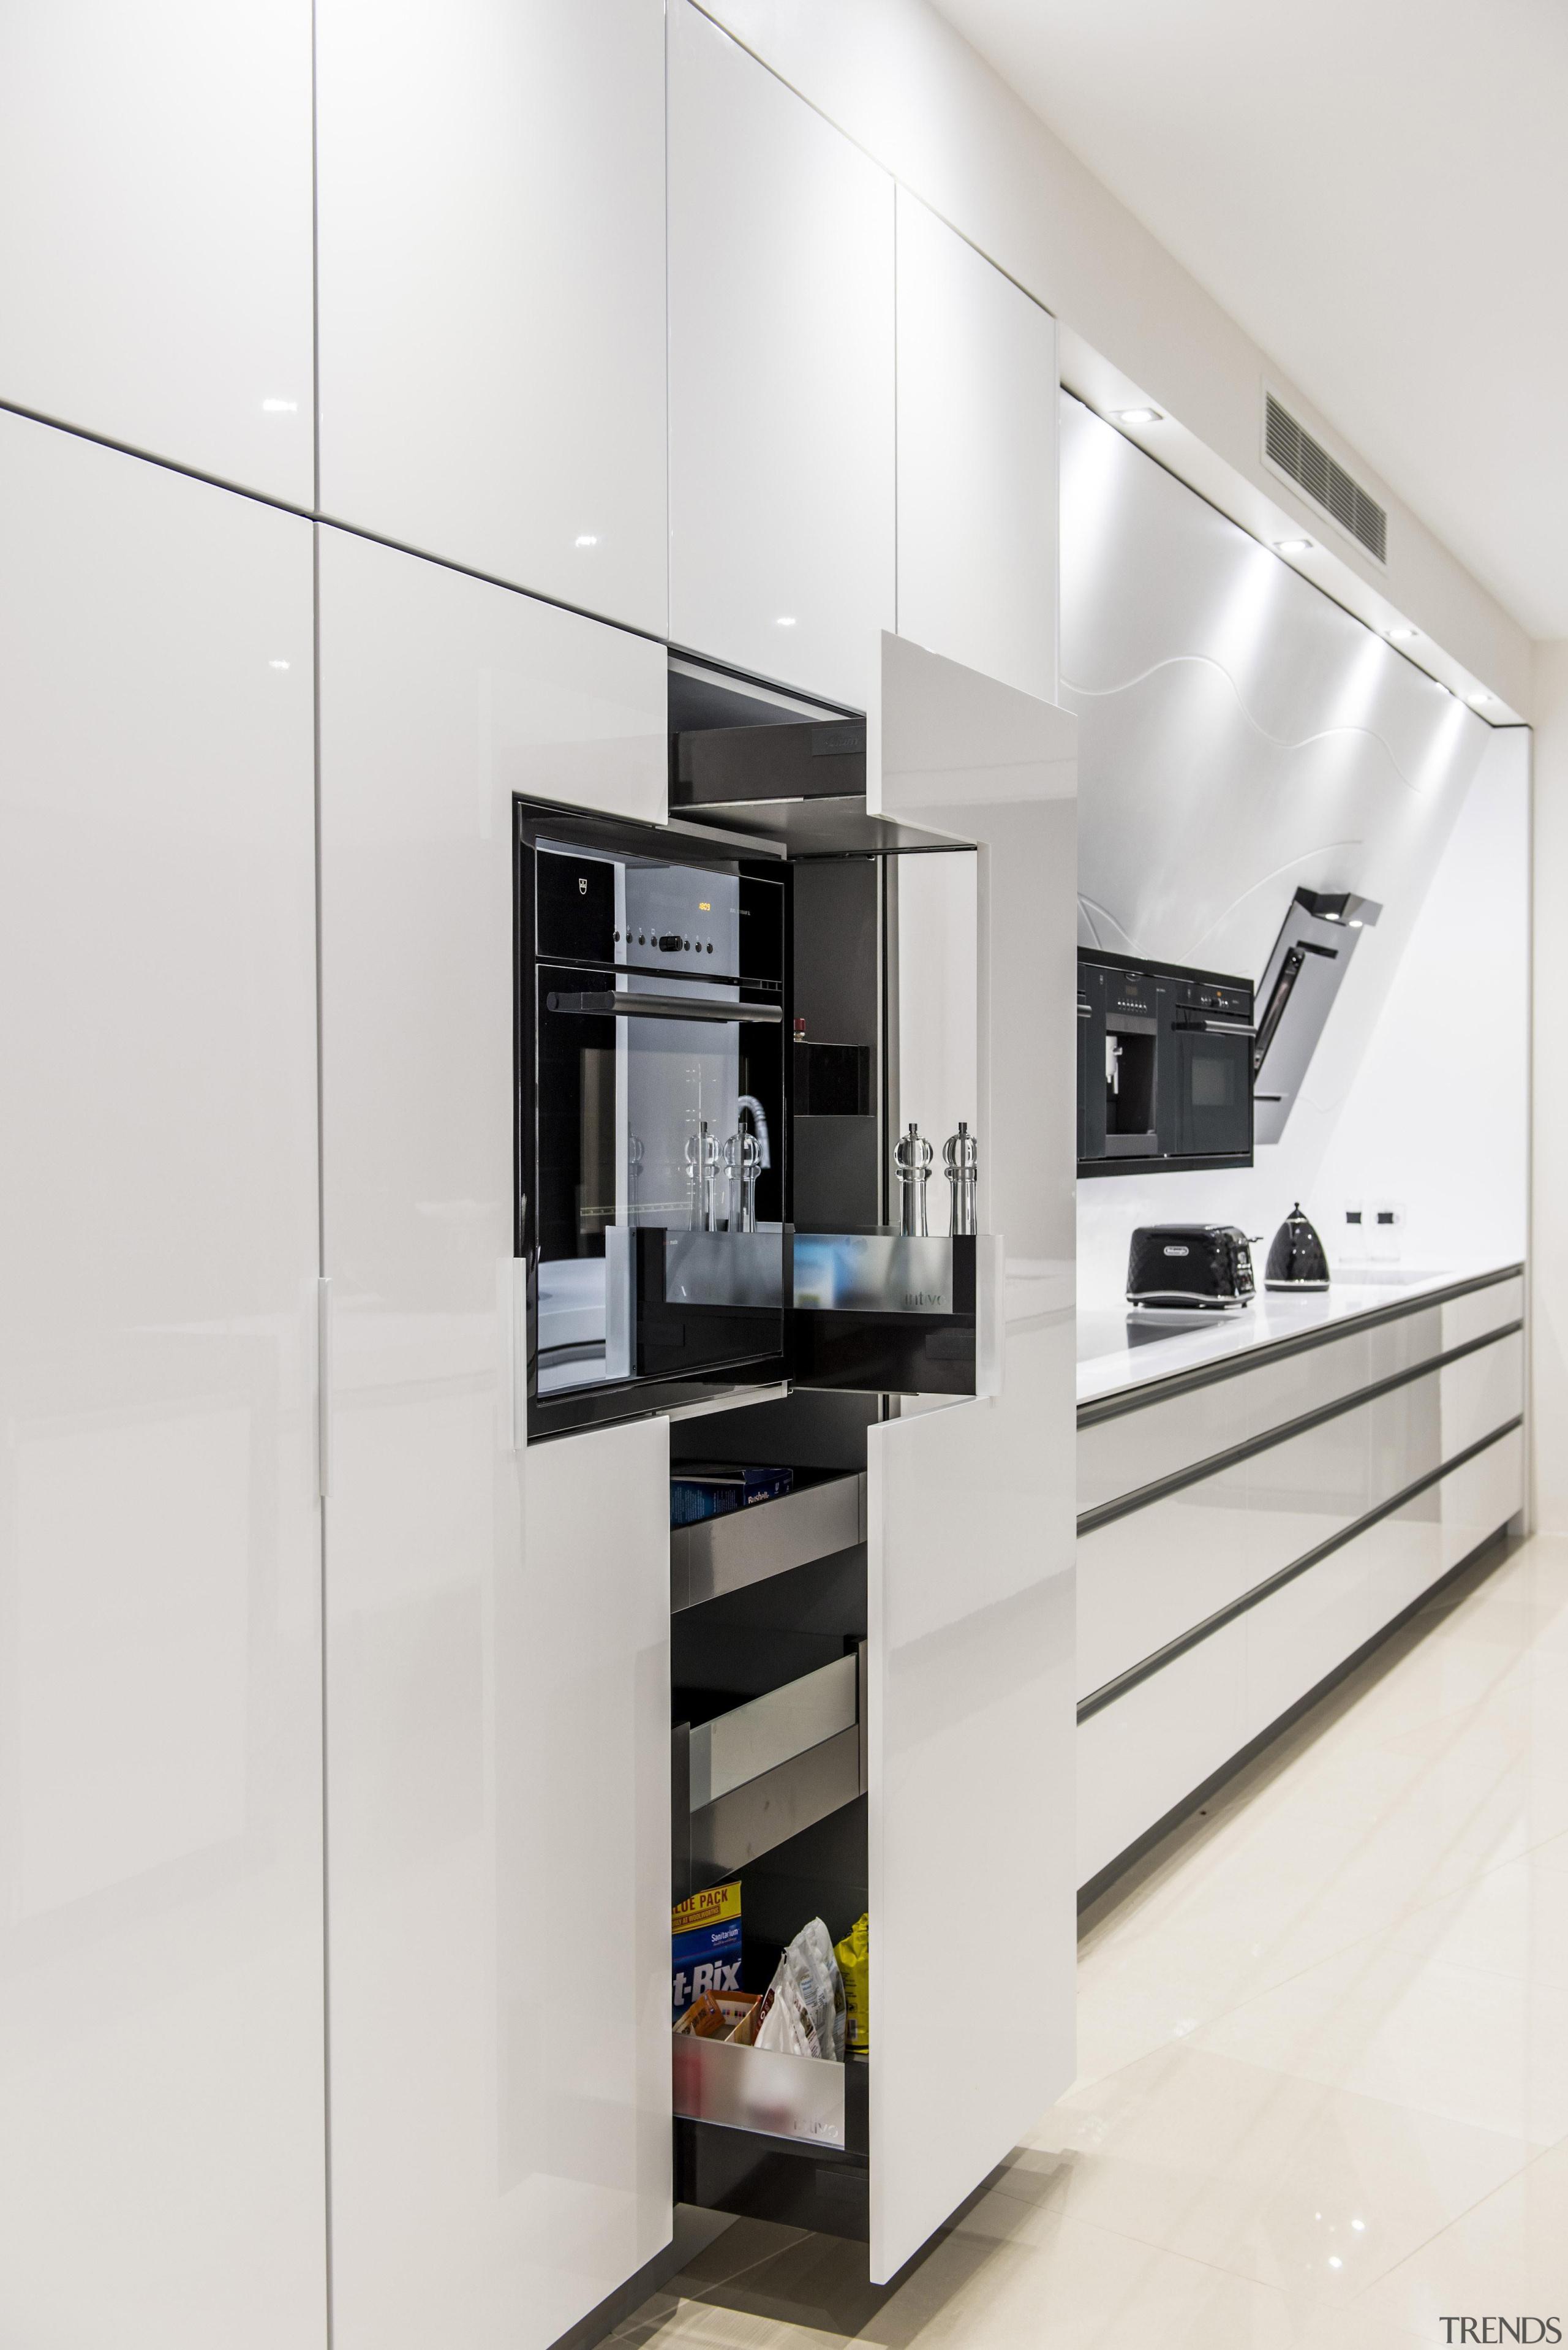 Winner Kitchen Design and Kitchen of the Year countertop, home appliance, interior design, kitchen, major appliance, product design, white